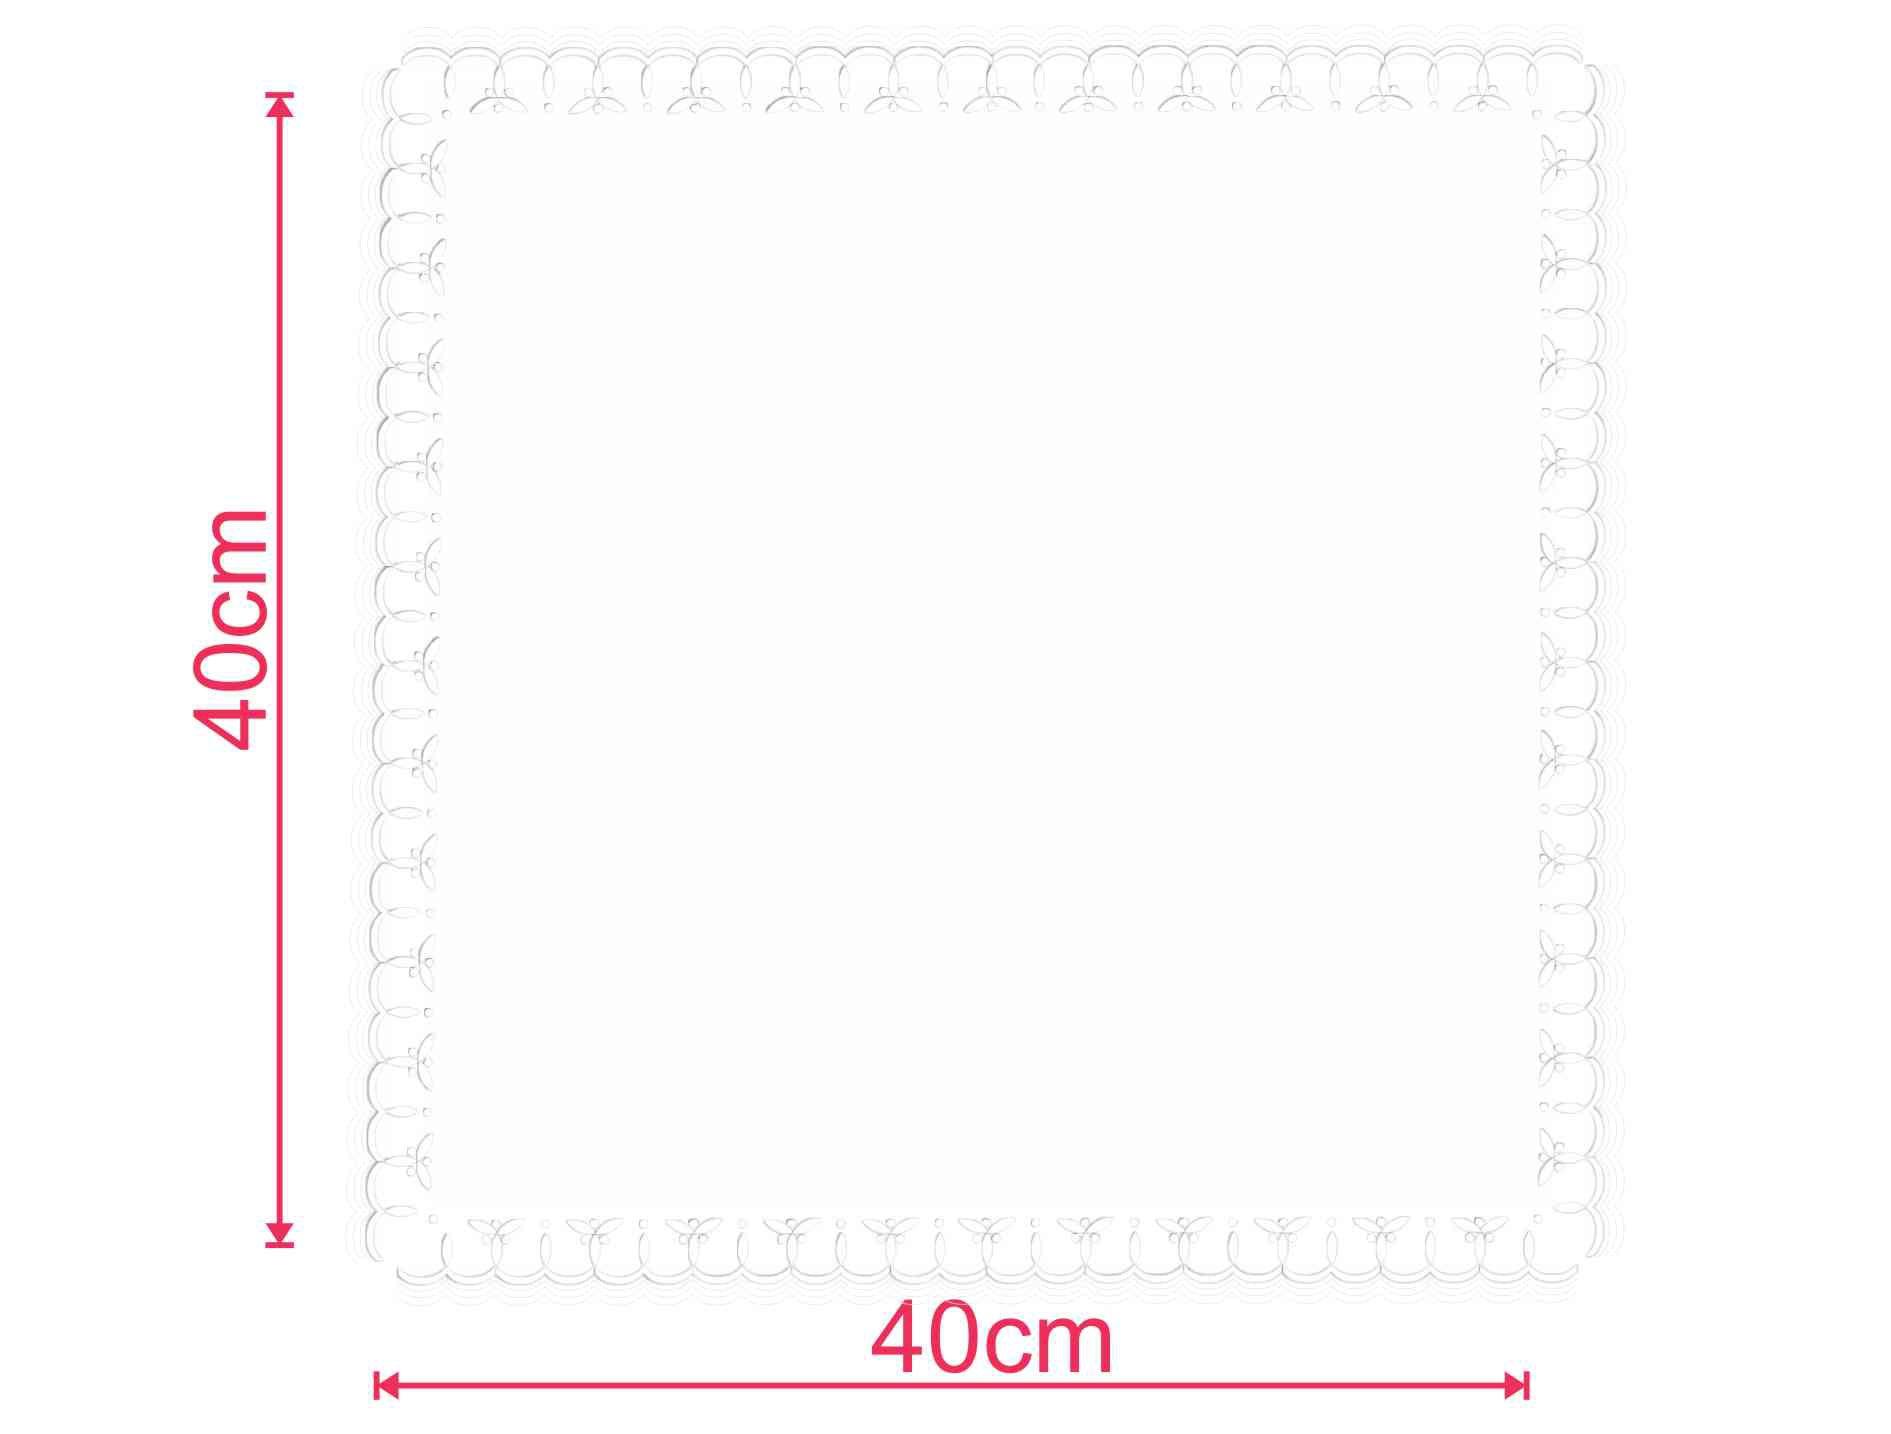 Guardanapo de papel mod. Trevo 40x40 cm - Personalizado - 100 unidades  - Persona Guardanapos & Cia